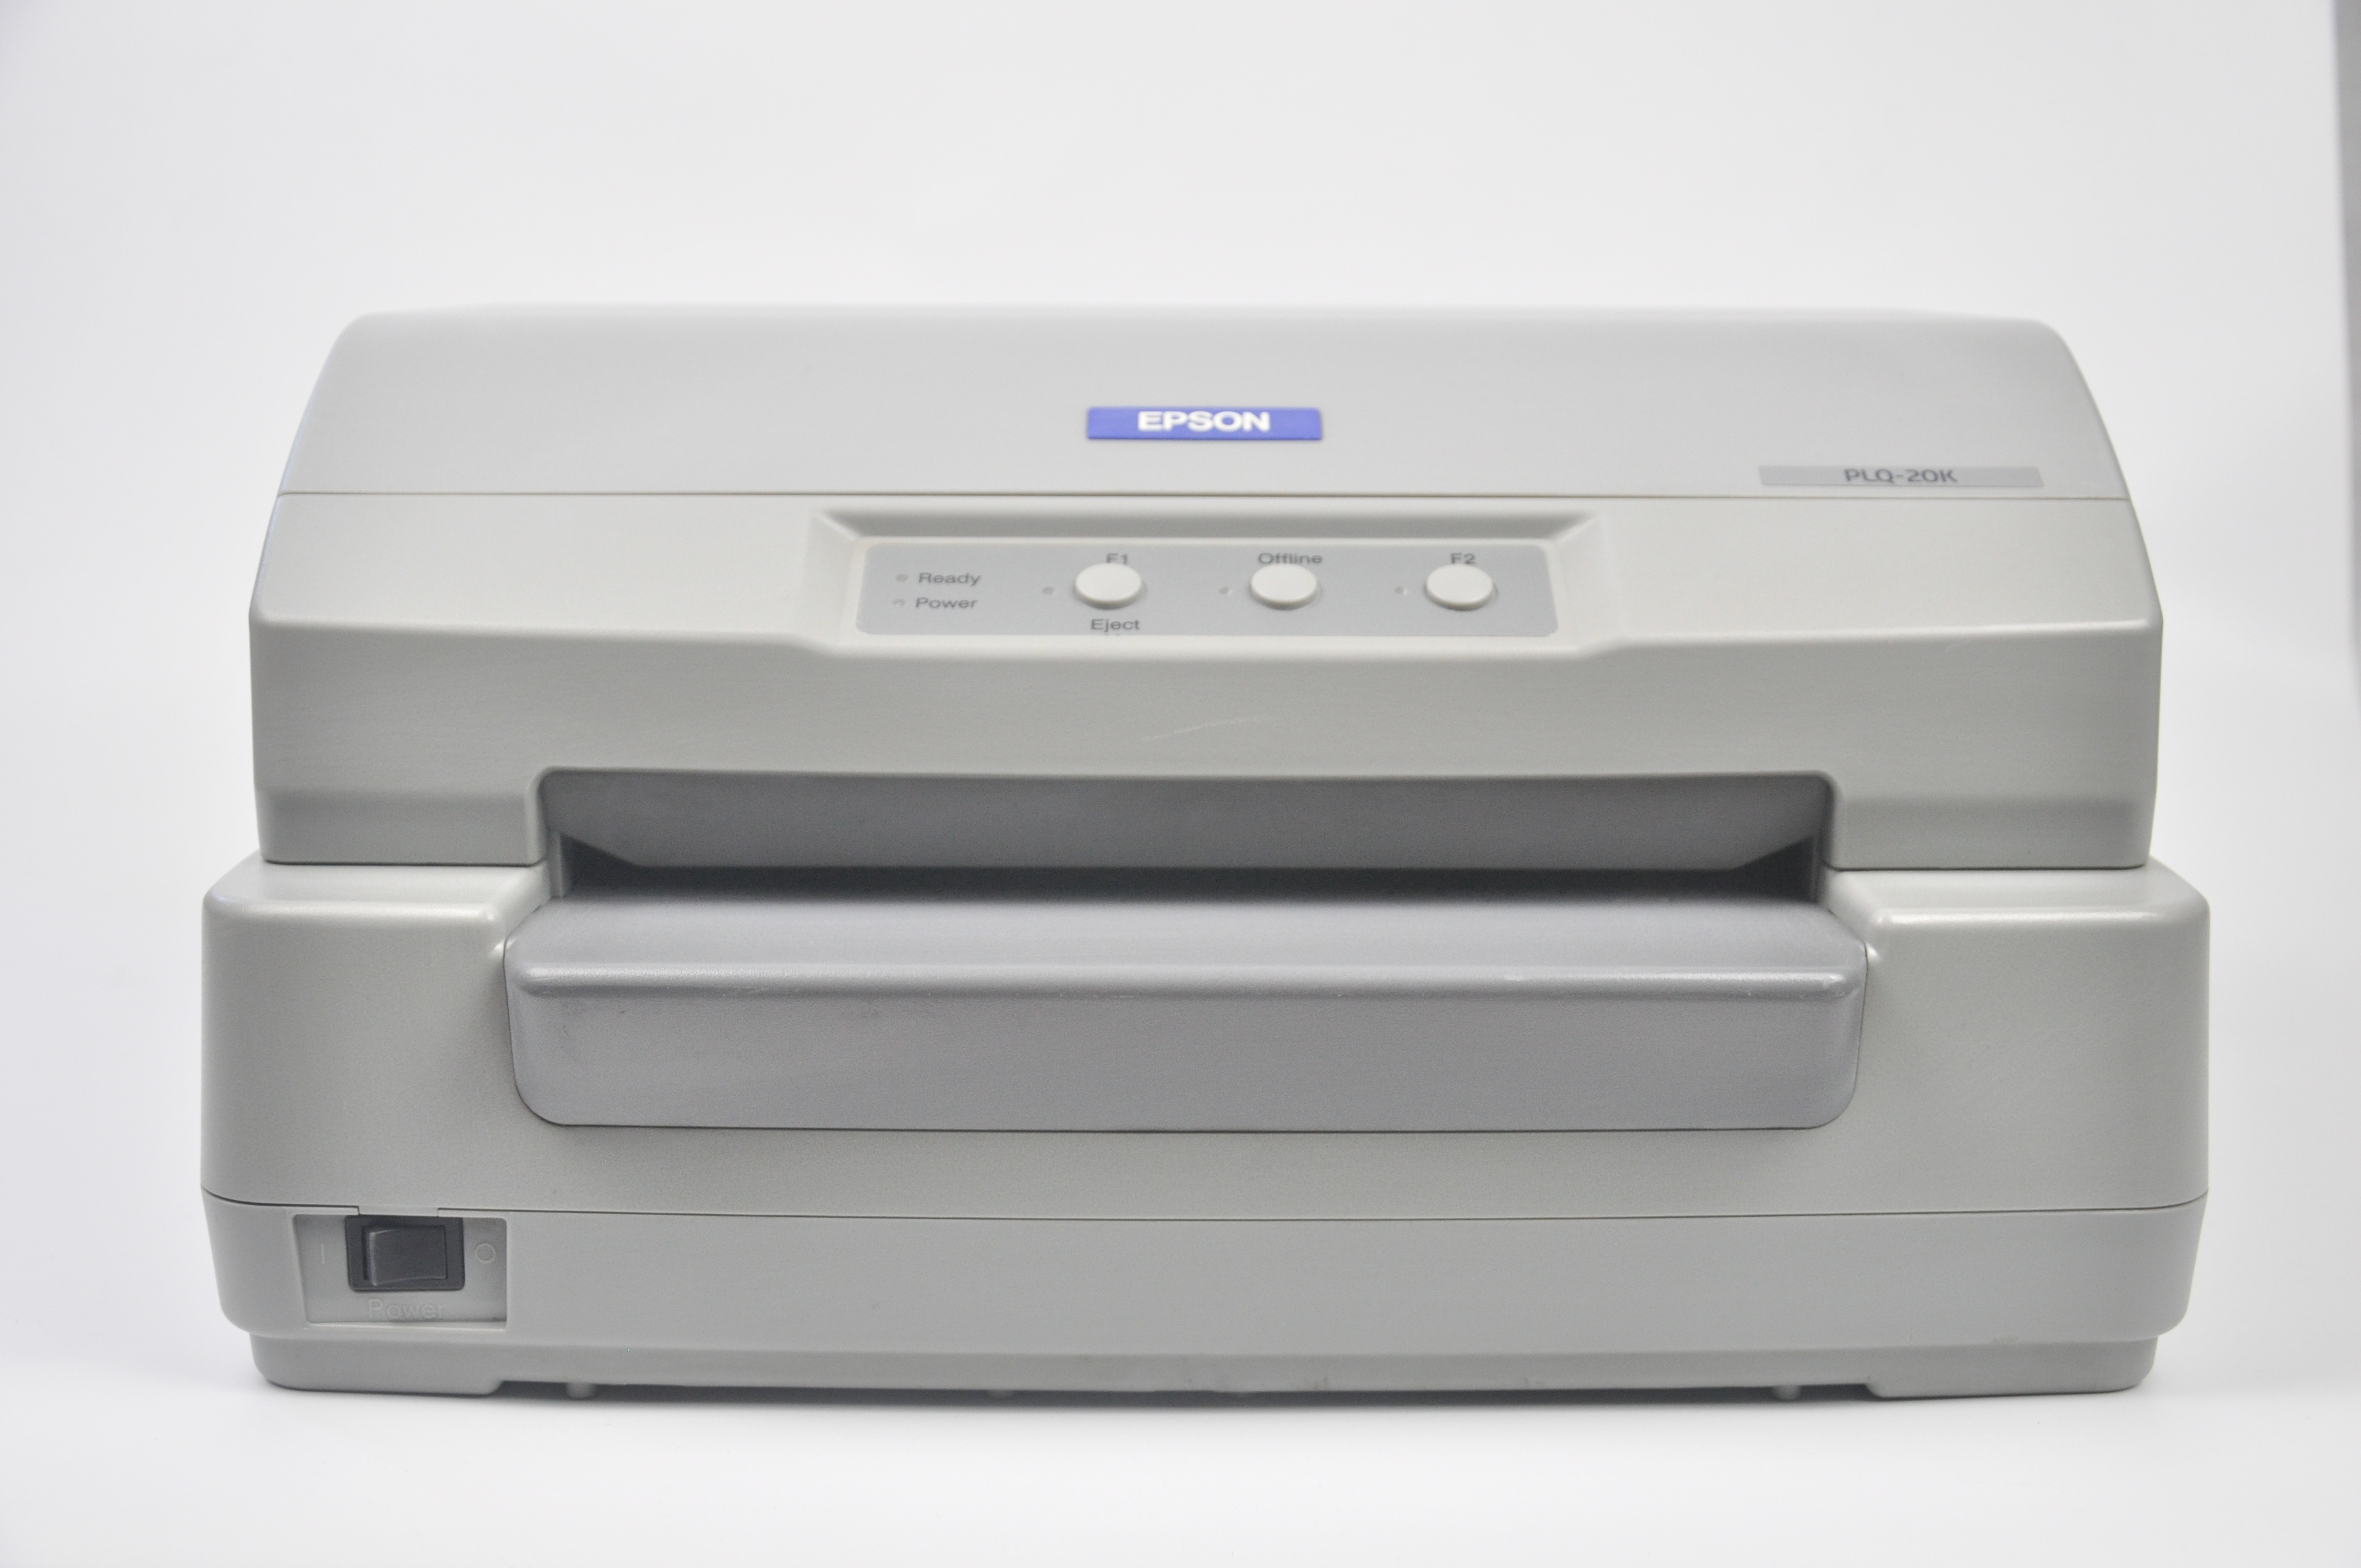 Epson PLQ20 OEM passbook printer